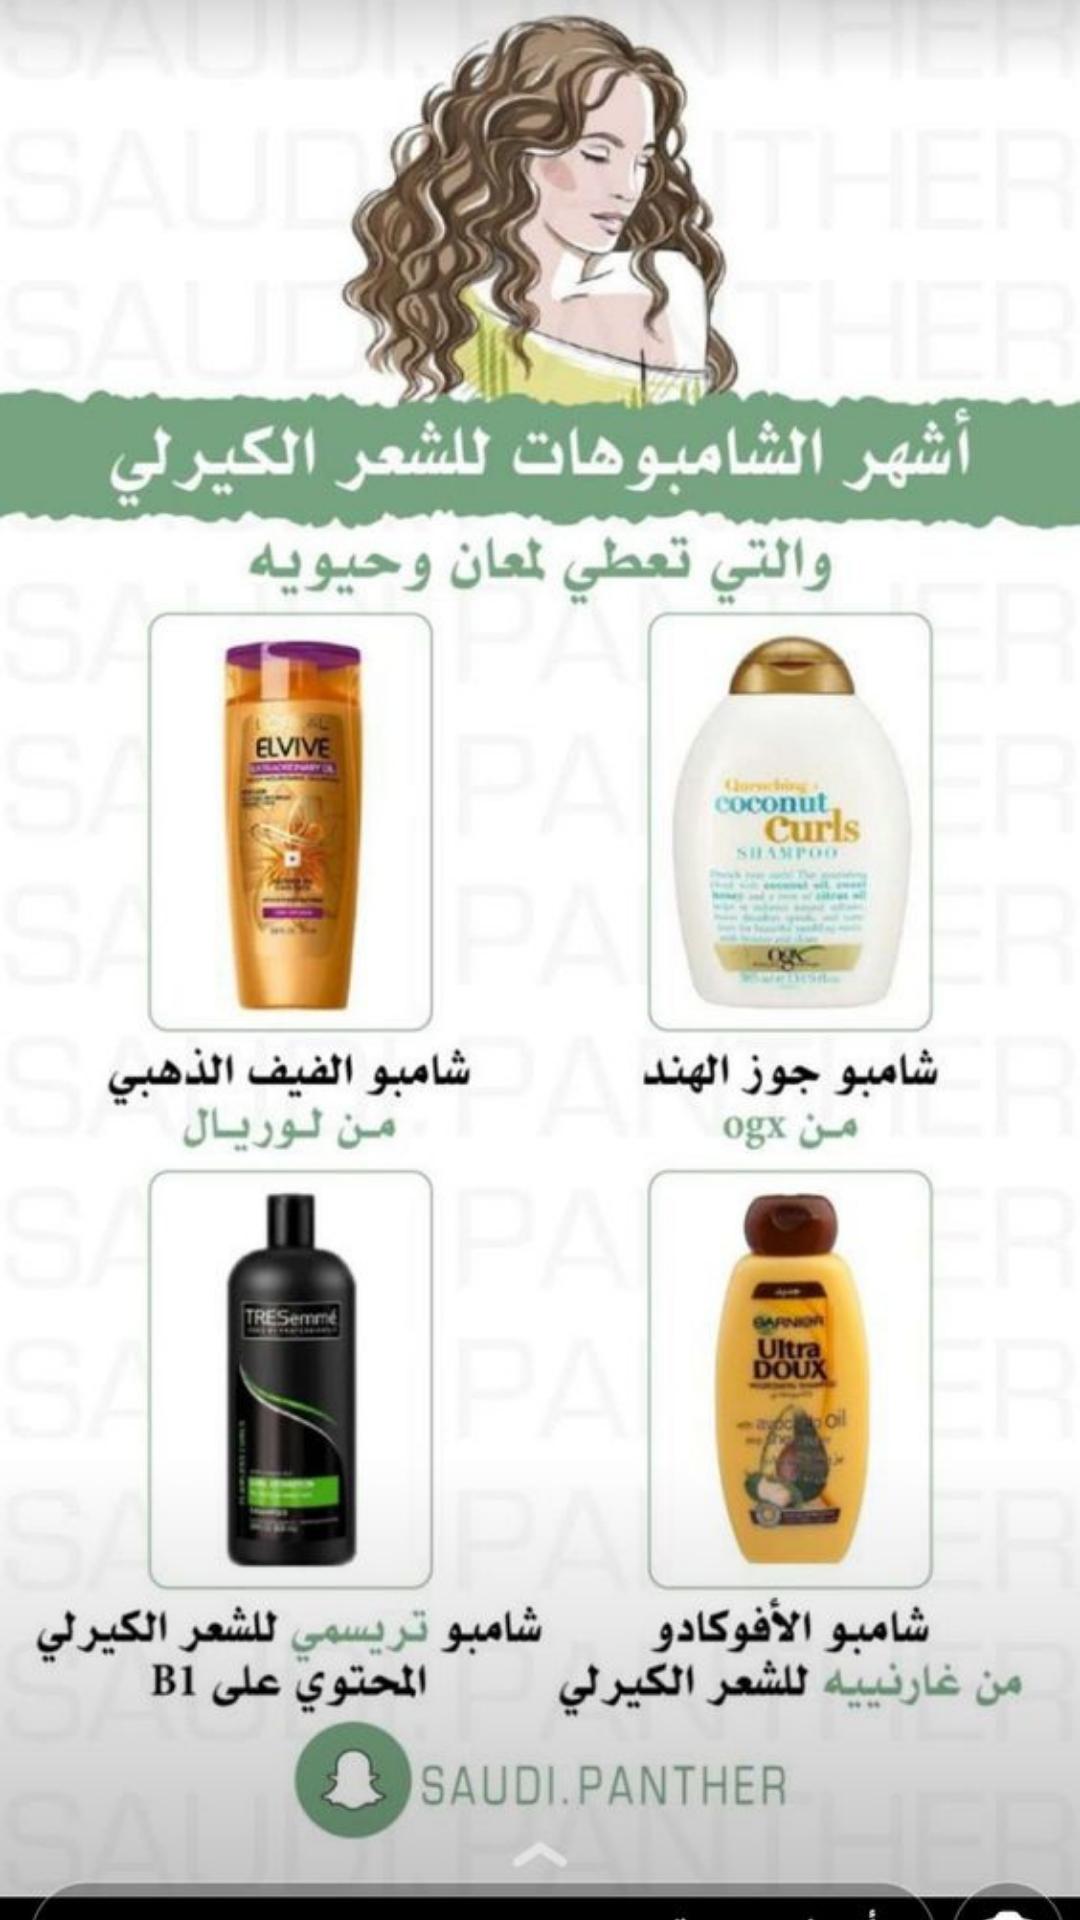 Garnier بلسم Whole Blends المغذي بمستخلص زيت الأفوكادو وزبدة الشيا سائل الوزن 22 أوز 650 مل In 2021 Hair Care Oils Pretty Skin Care Beauty Skin Care Routine